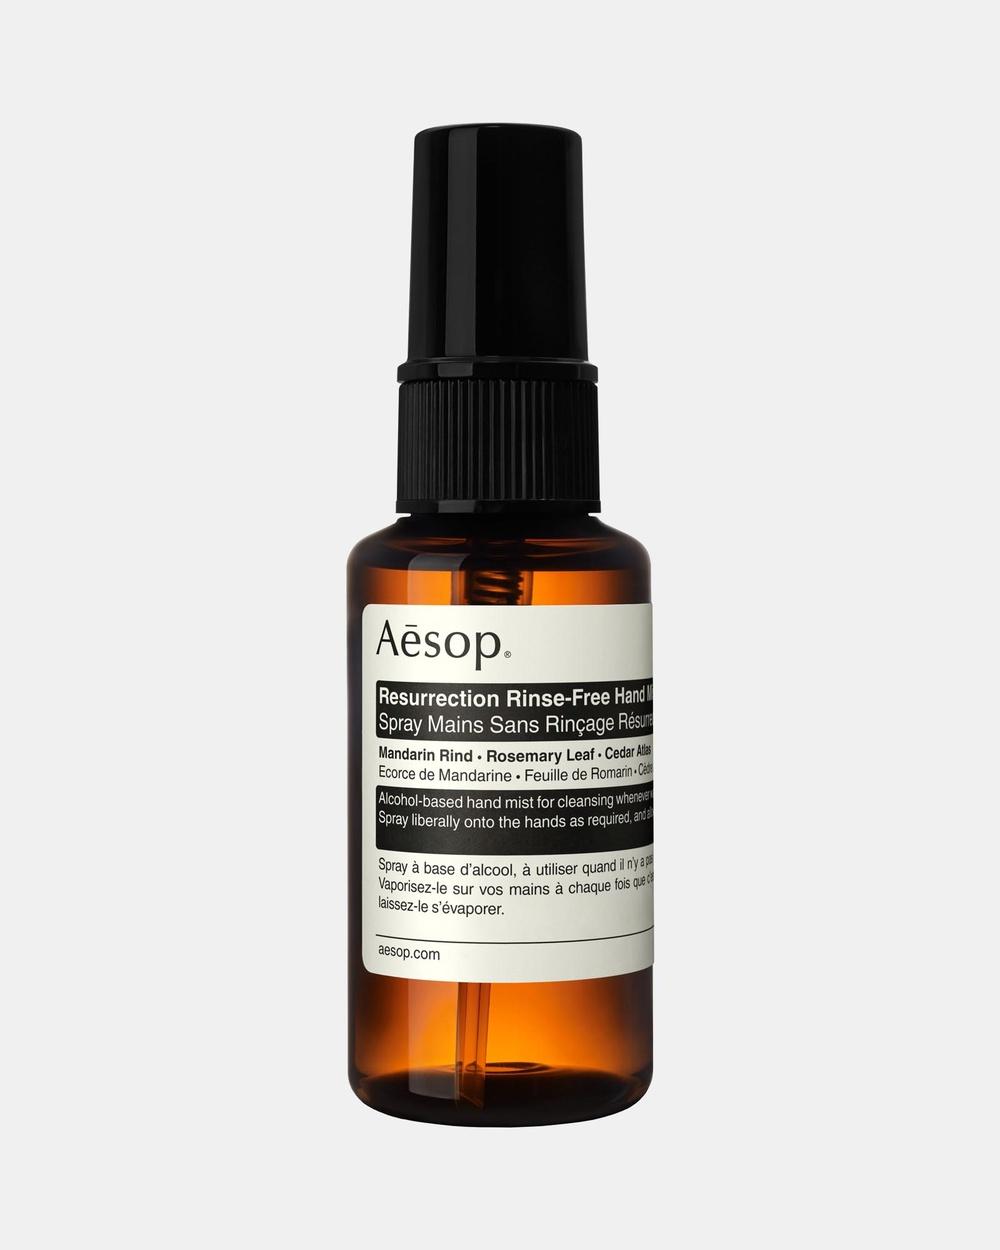 Aesop Resurrection Rinse Free Hand Mist 50mL Beauty 50mL Rinse-Free